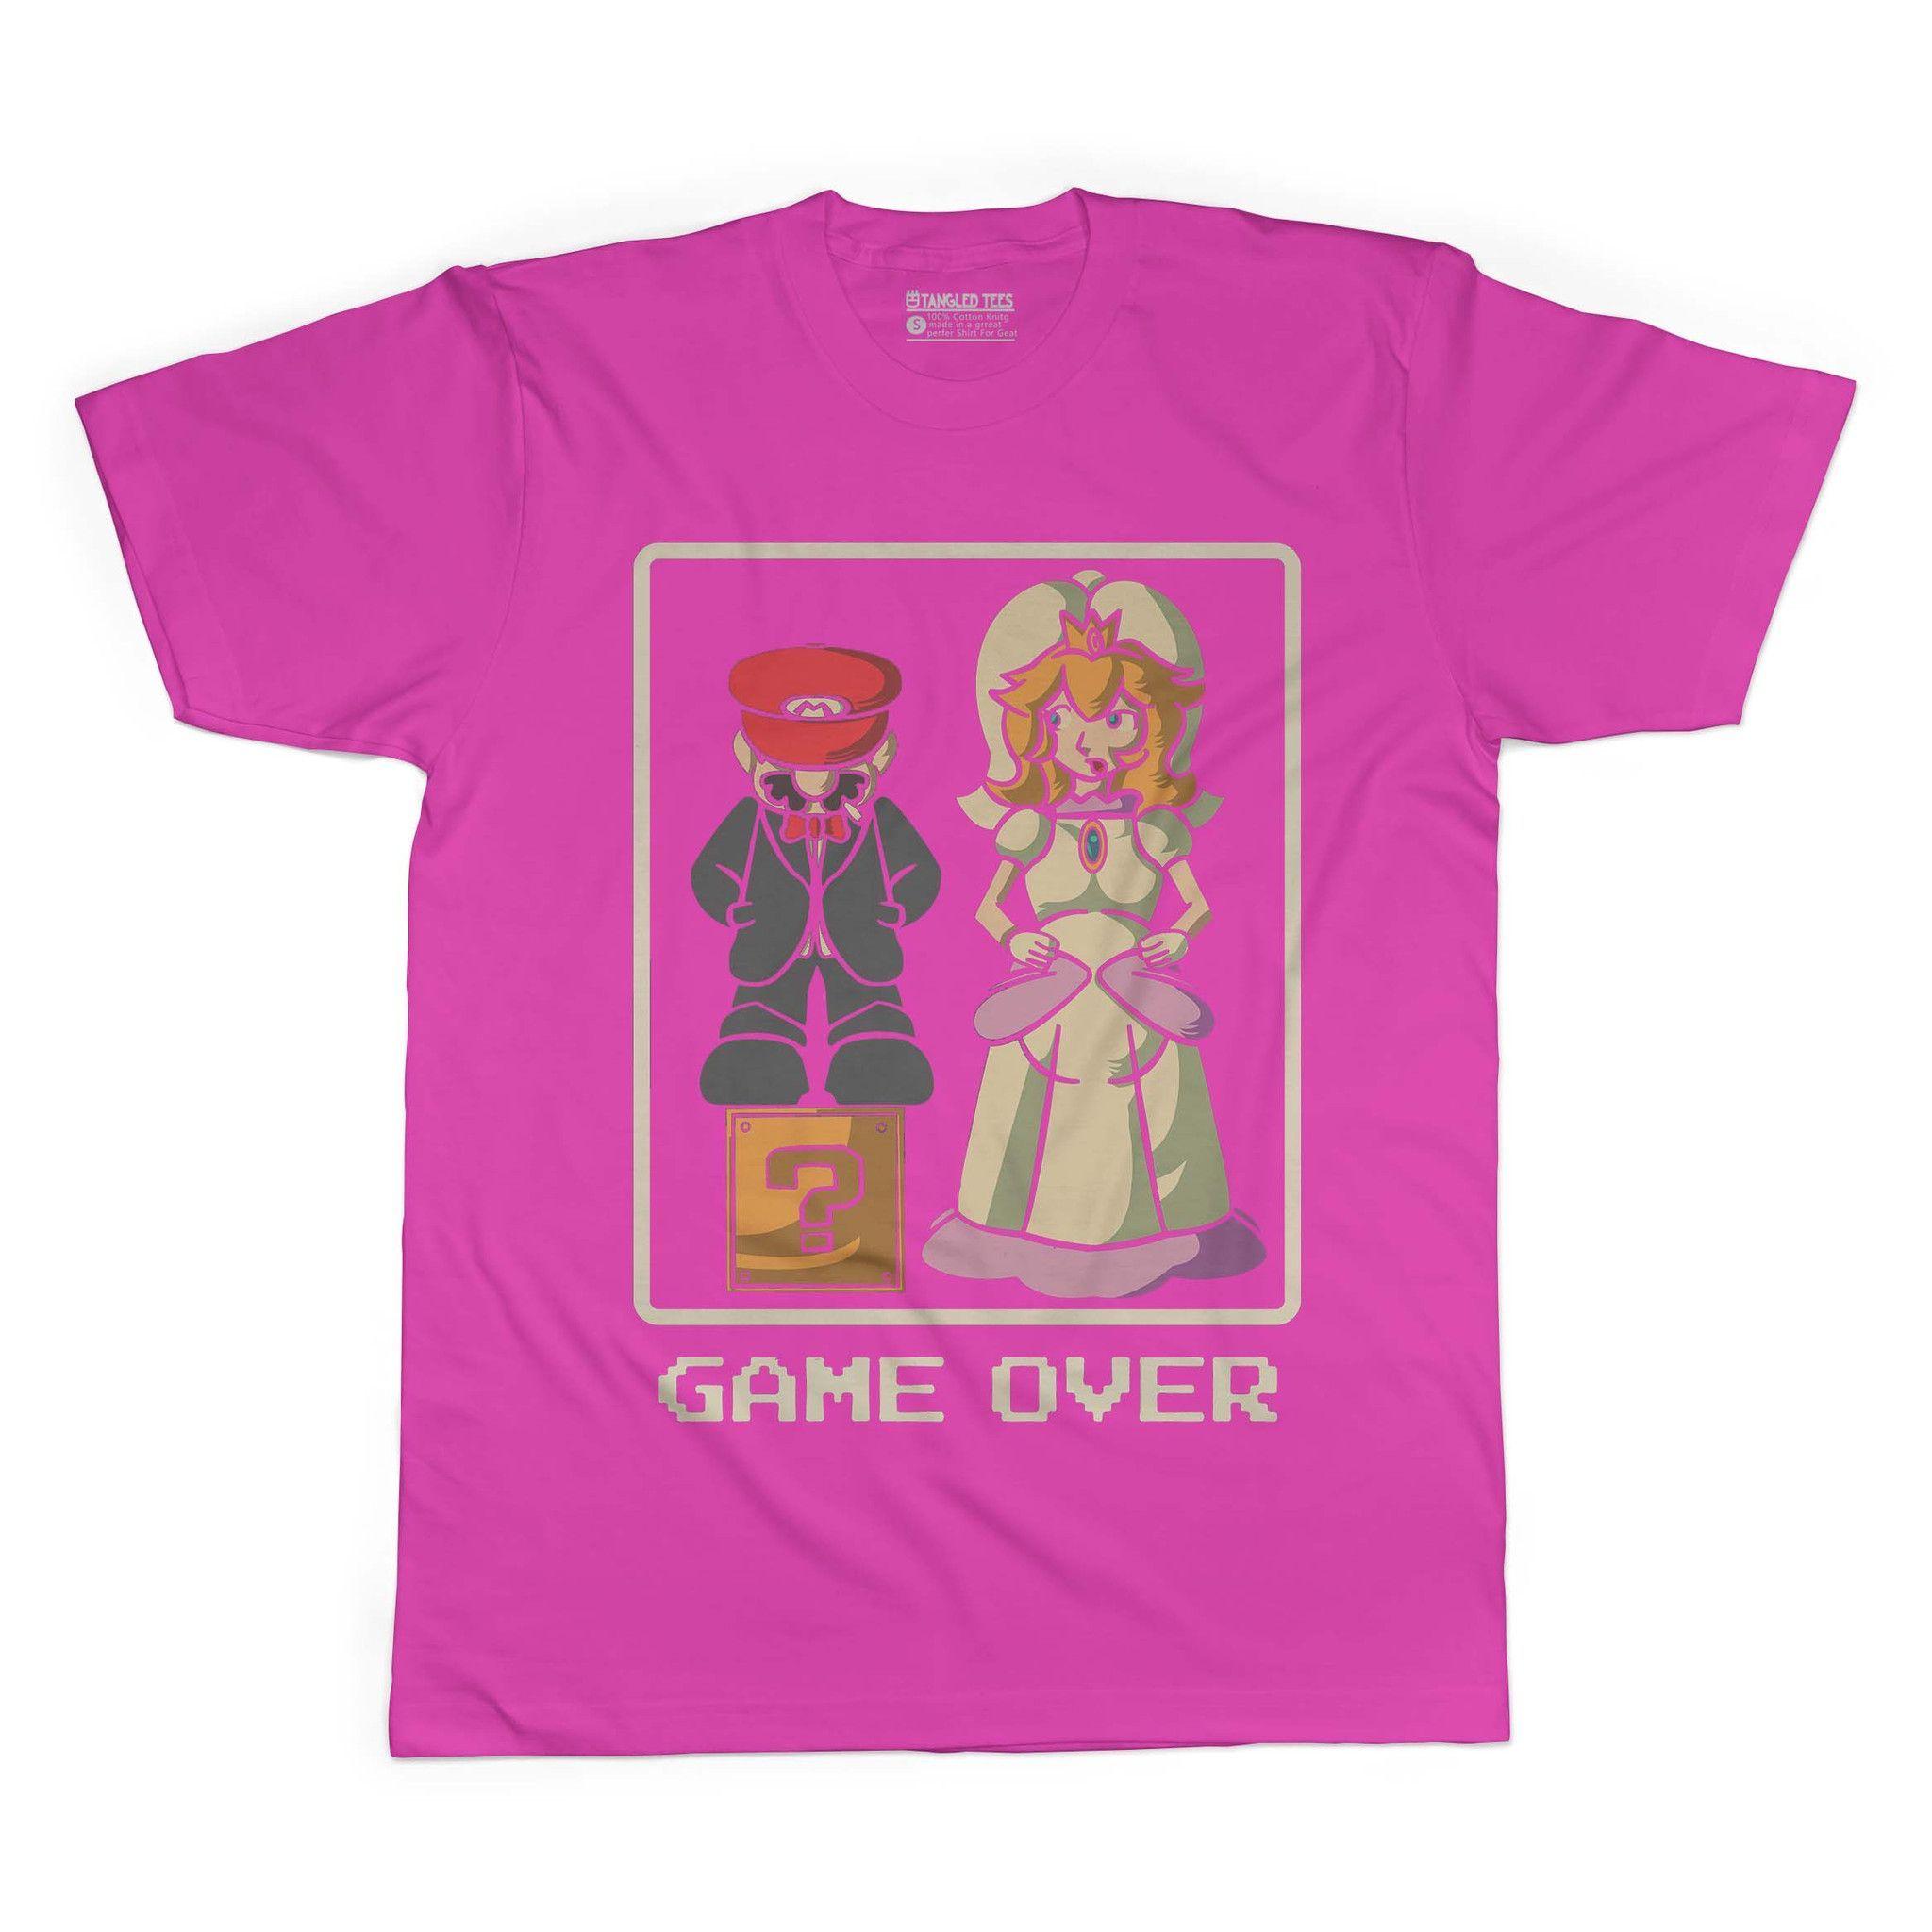 Game Over Adult Tee Shirt